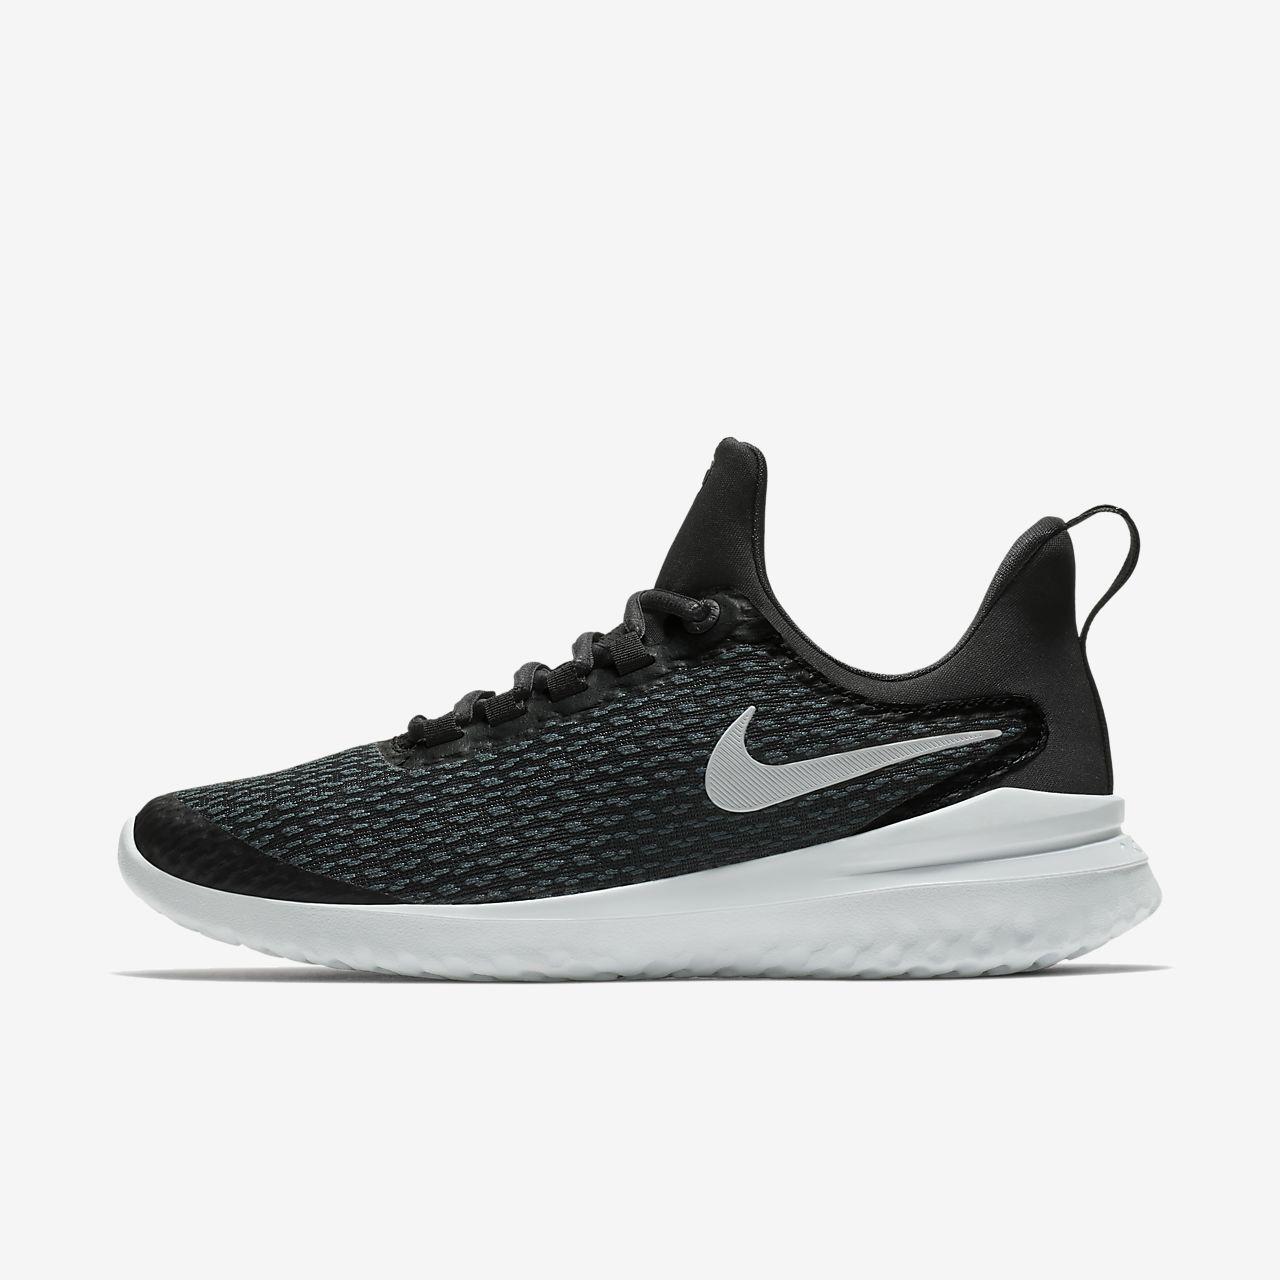 Sapatilhas de running Nike Renew Rival para mulher